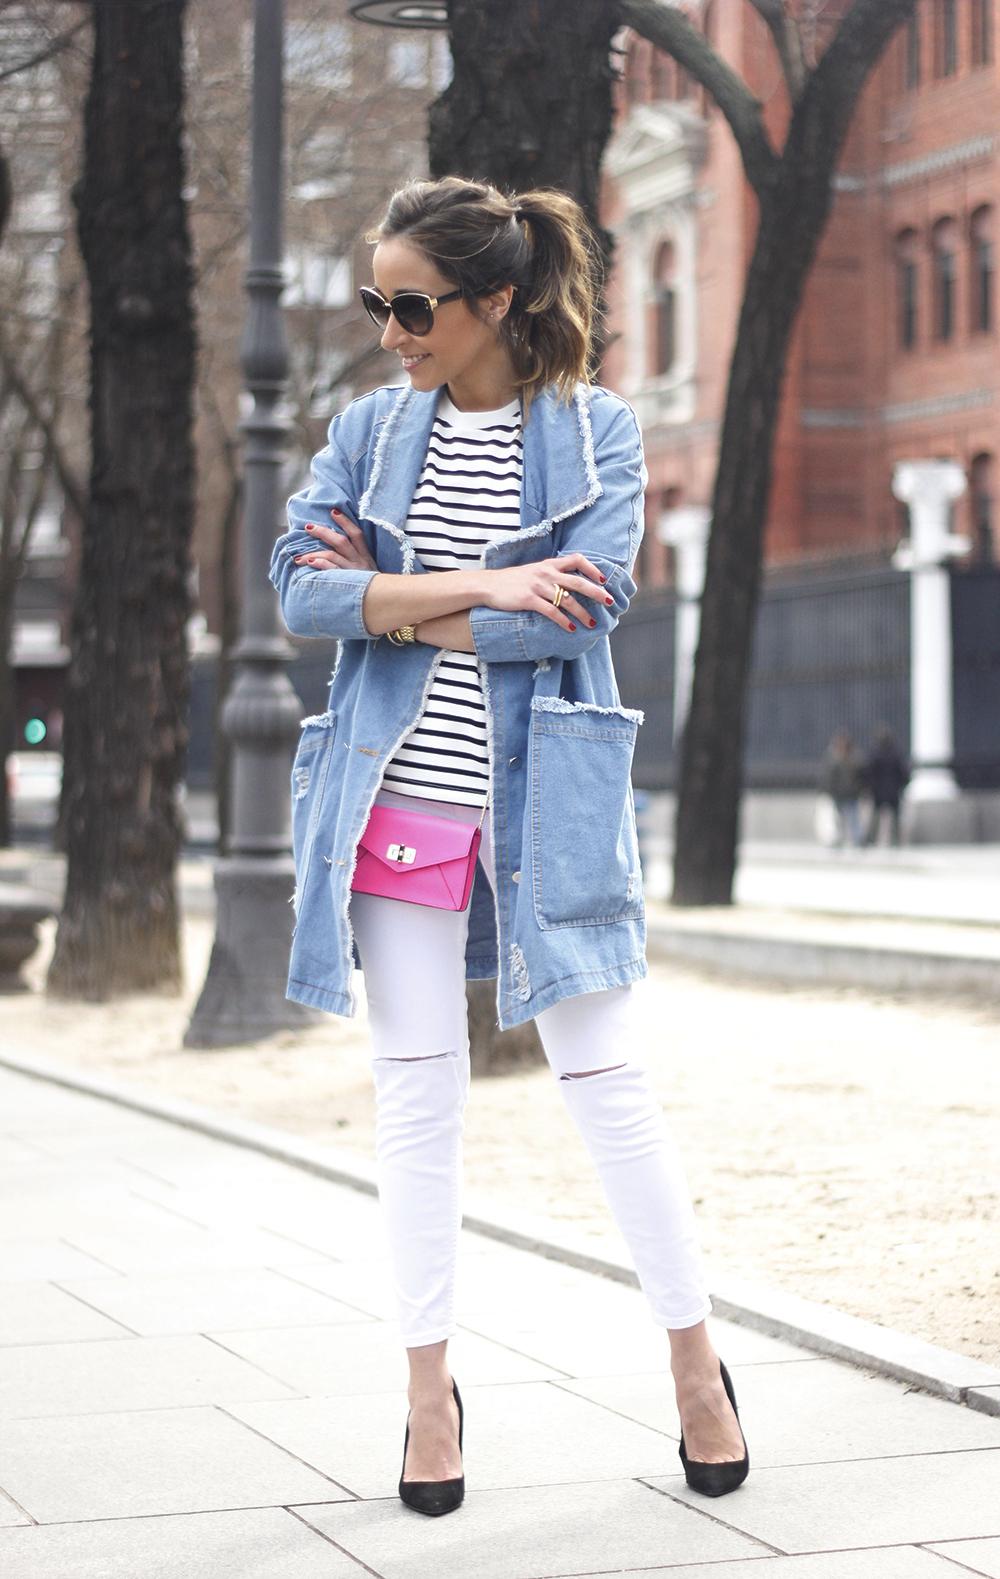 Stripes and Denim Coat Gloria Ortiz Heels Accessories Sunnies Outfit18